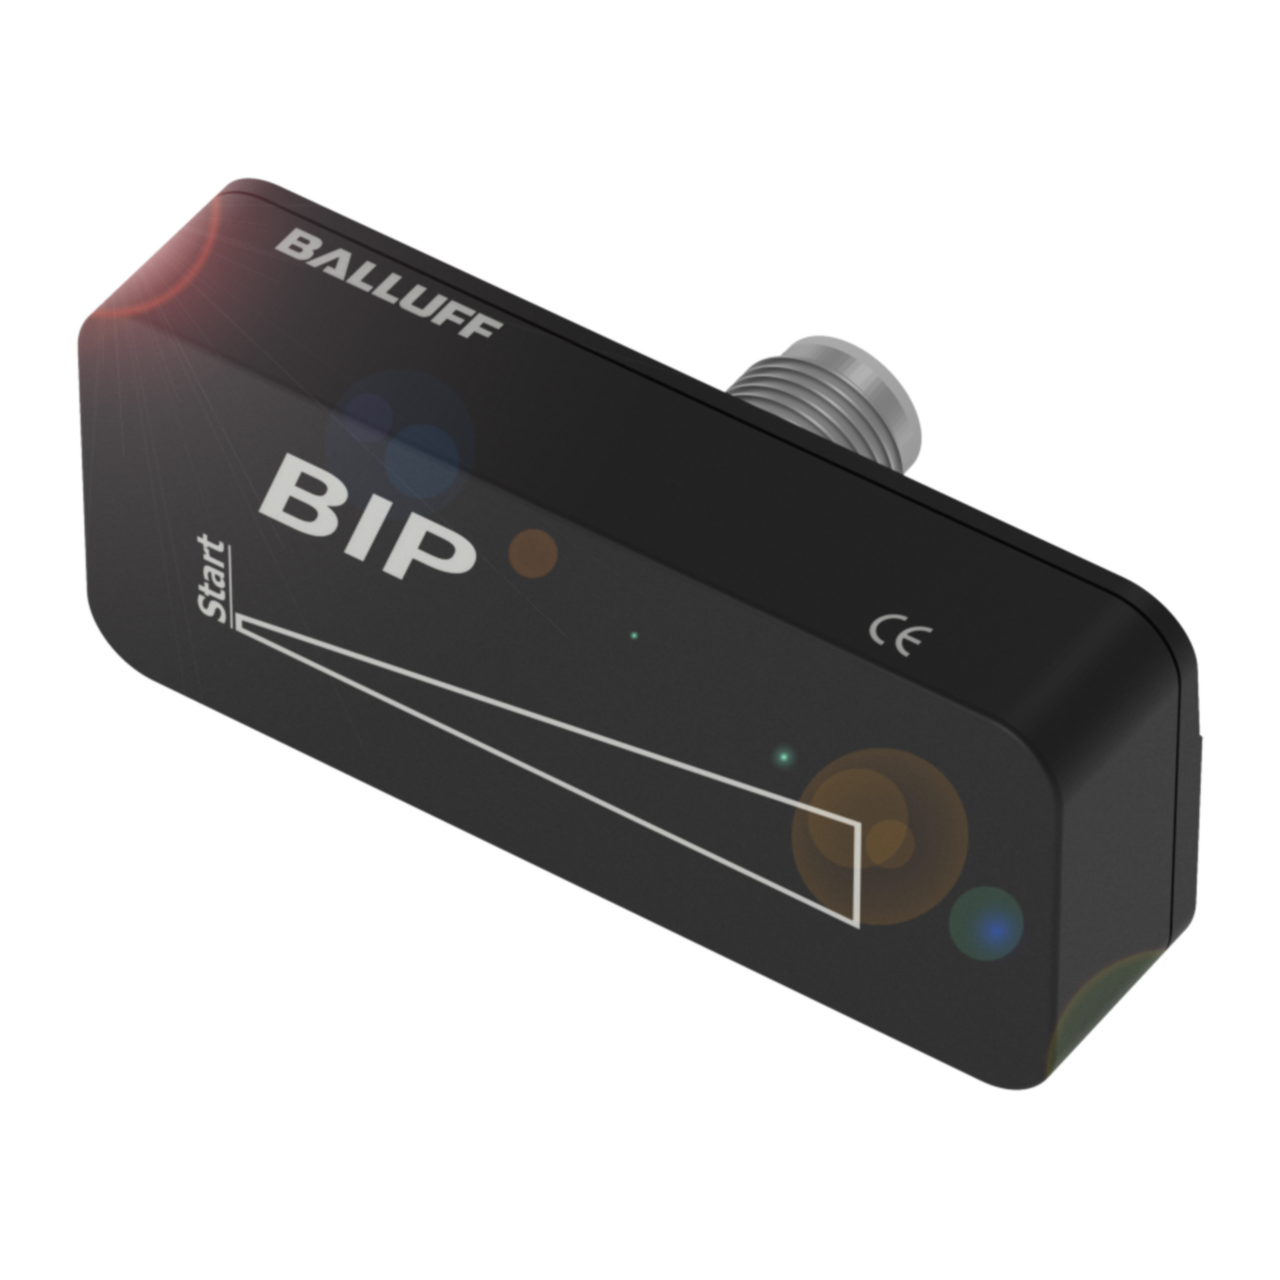 BIP0005 - BIP CD2-B040-02-S4 - Balluff